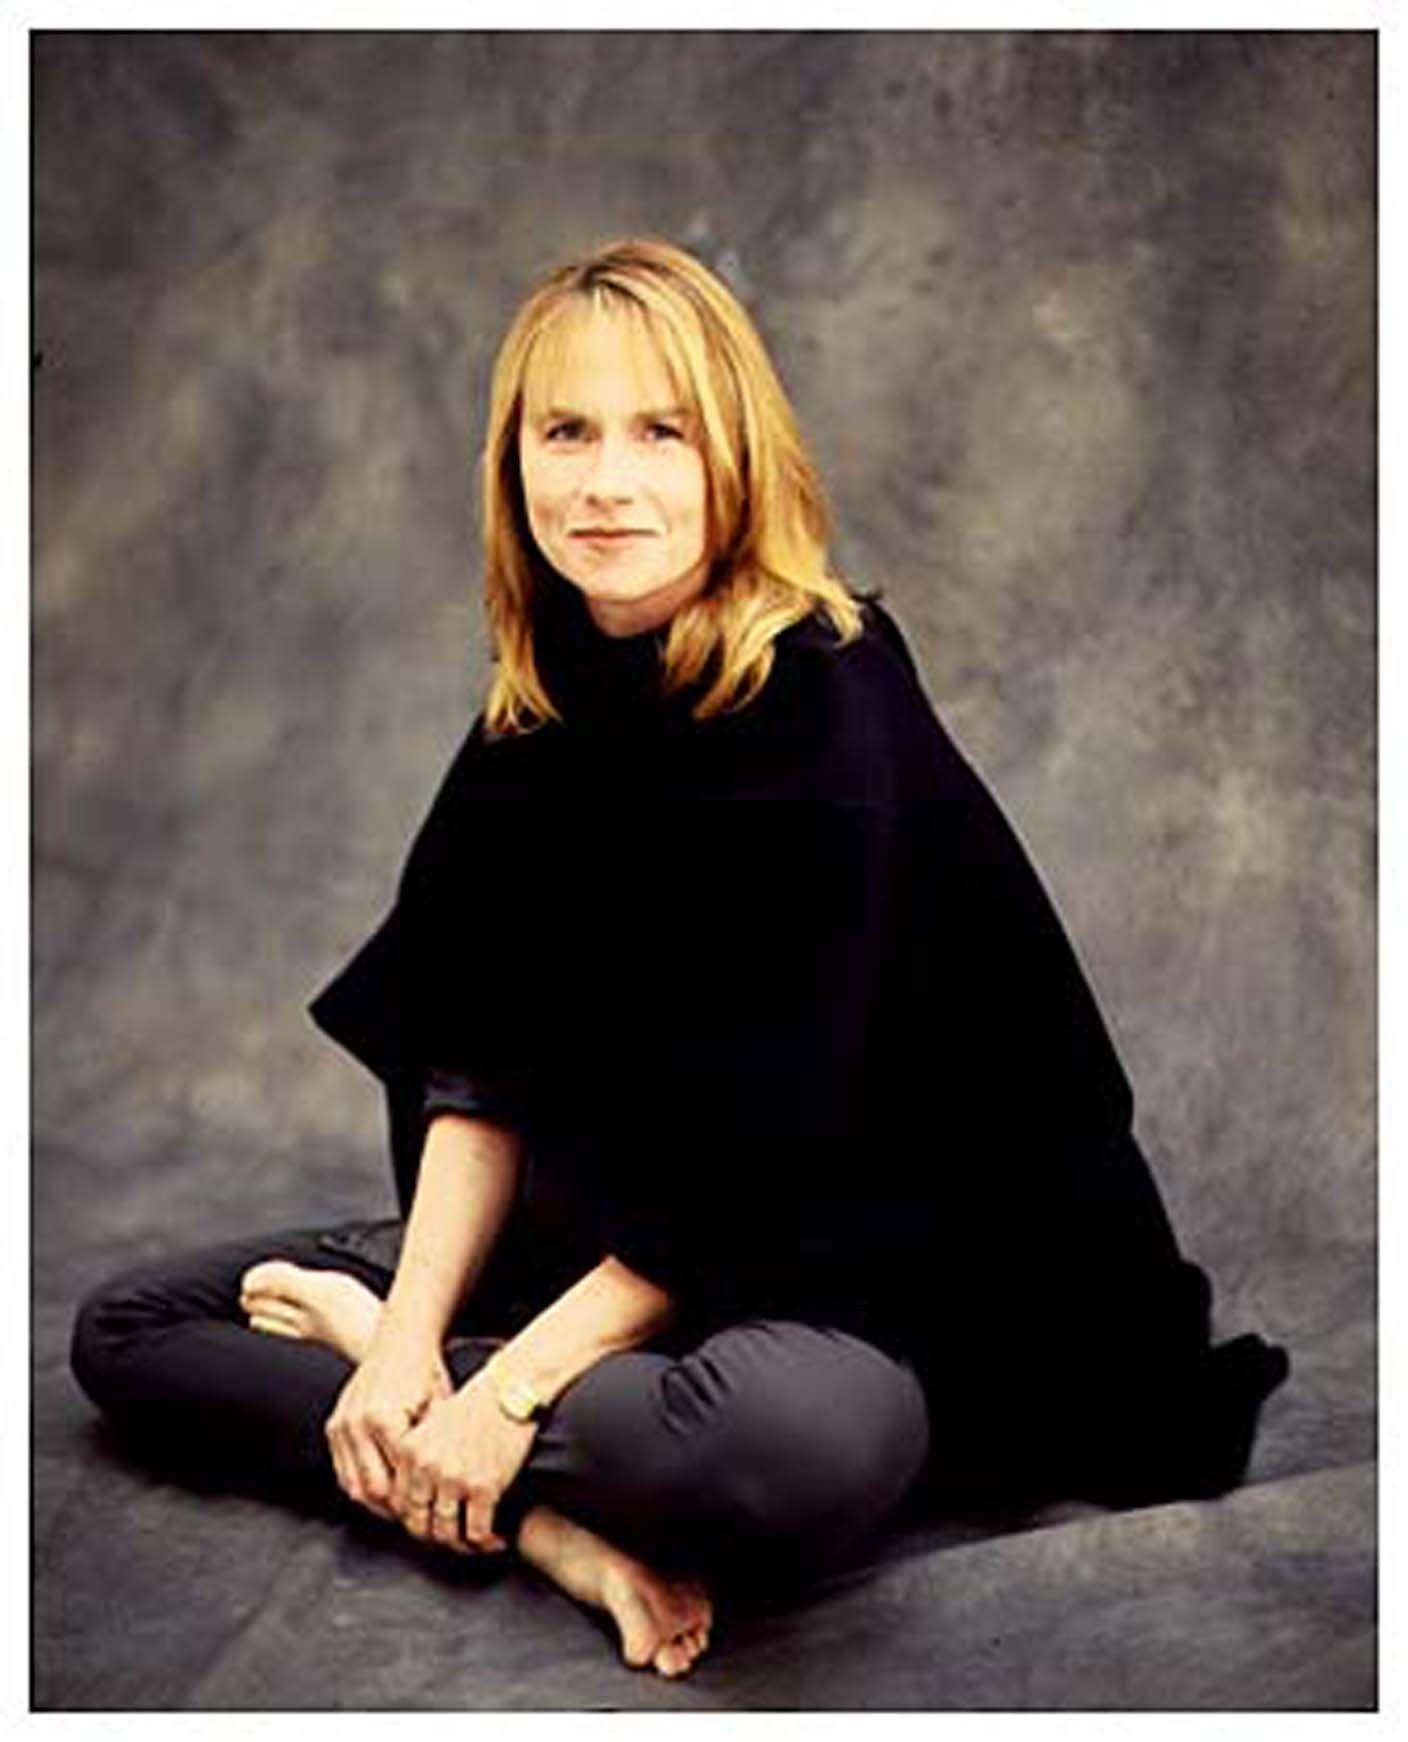 Leslie Brooks,Maria Karnilova Porno video Linda Louise Duan,Rhea Durham USA 2 2000-2001